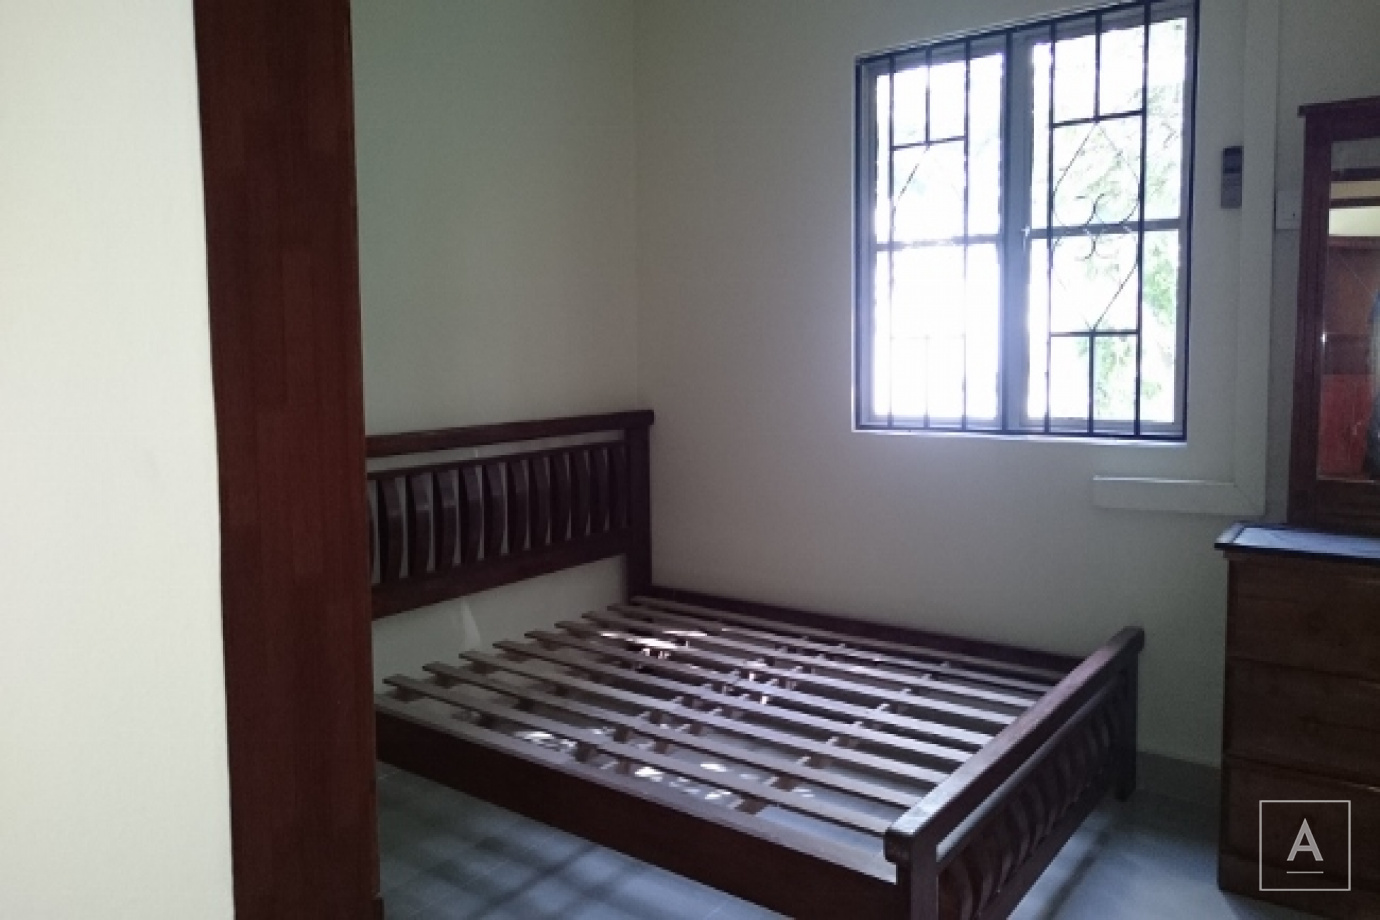 Pantai Hillpark 5, Bangsar,Kuala Lumpur, 3 Bedrooms Bedrooms, ,2 BathroomsBathrooms,Condominium / Serviced Residence,For Sale,Pantai Hillpark Phase 5,1241